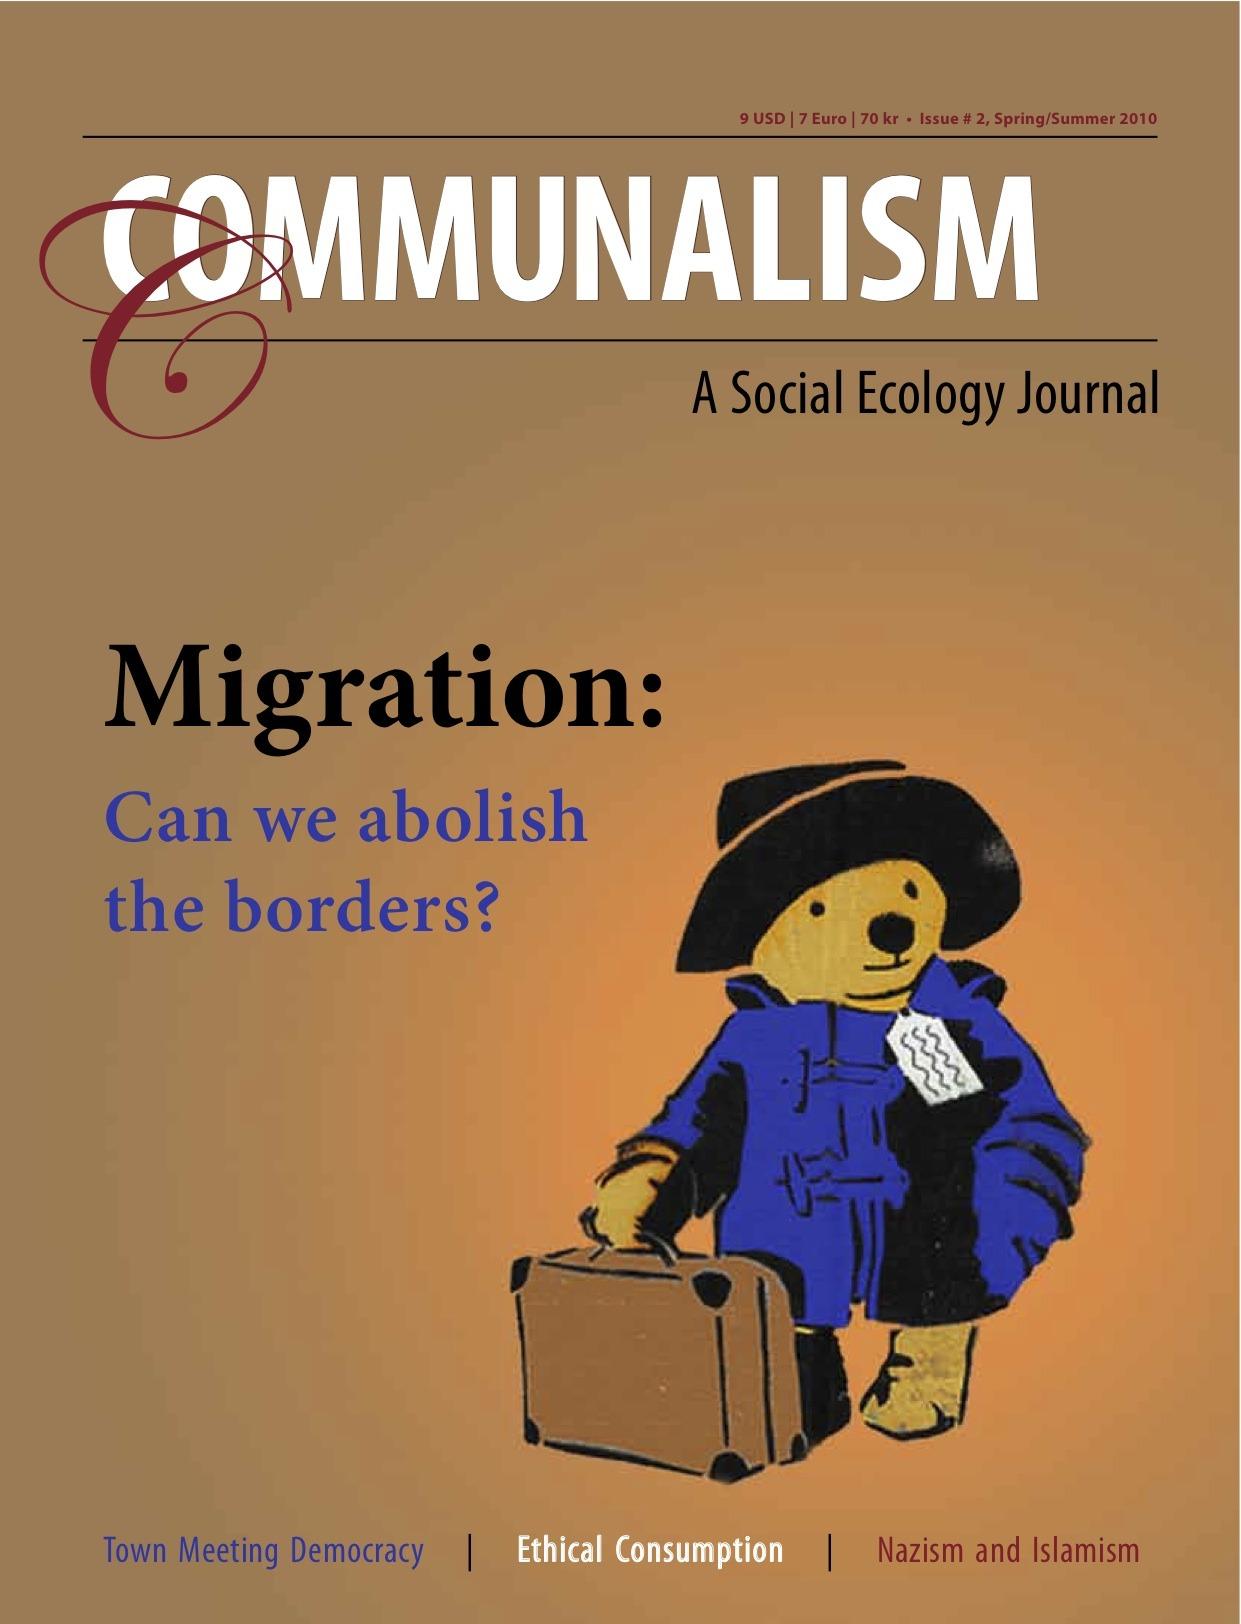 Communalism 2